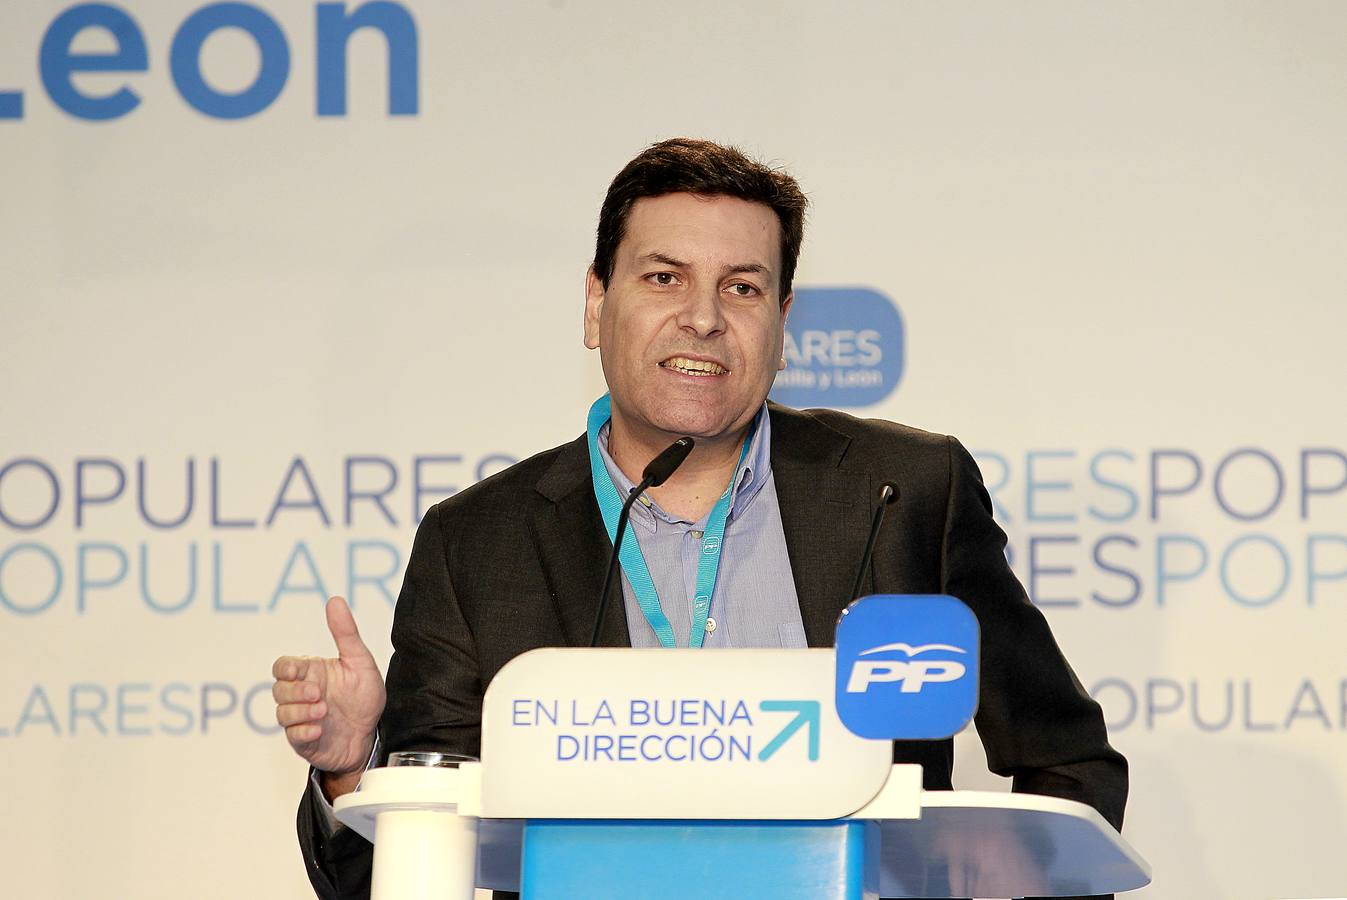 Convención autonómica del PP en Magaz de Pisuierga. Palencia (2/2)